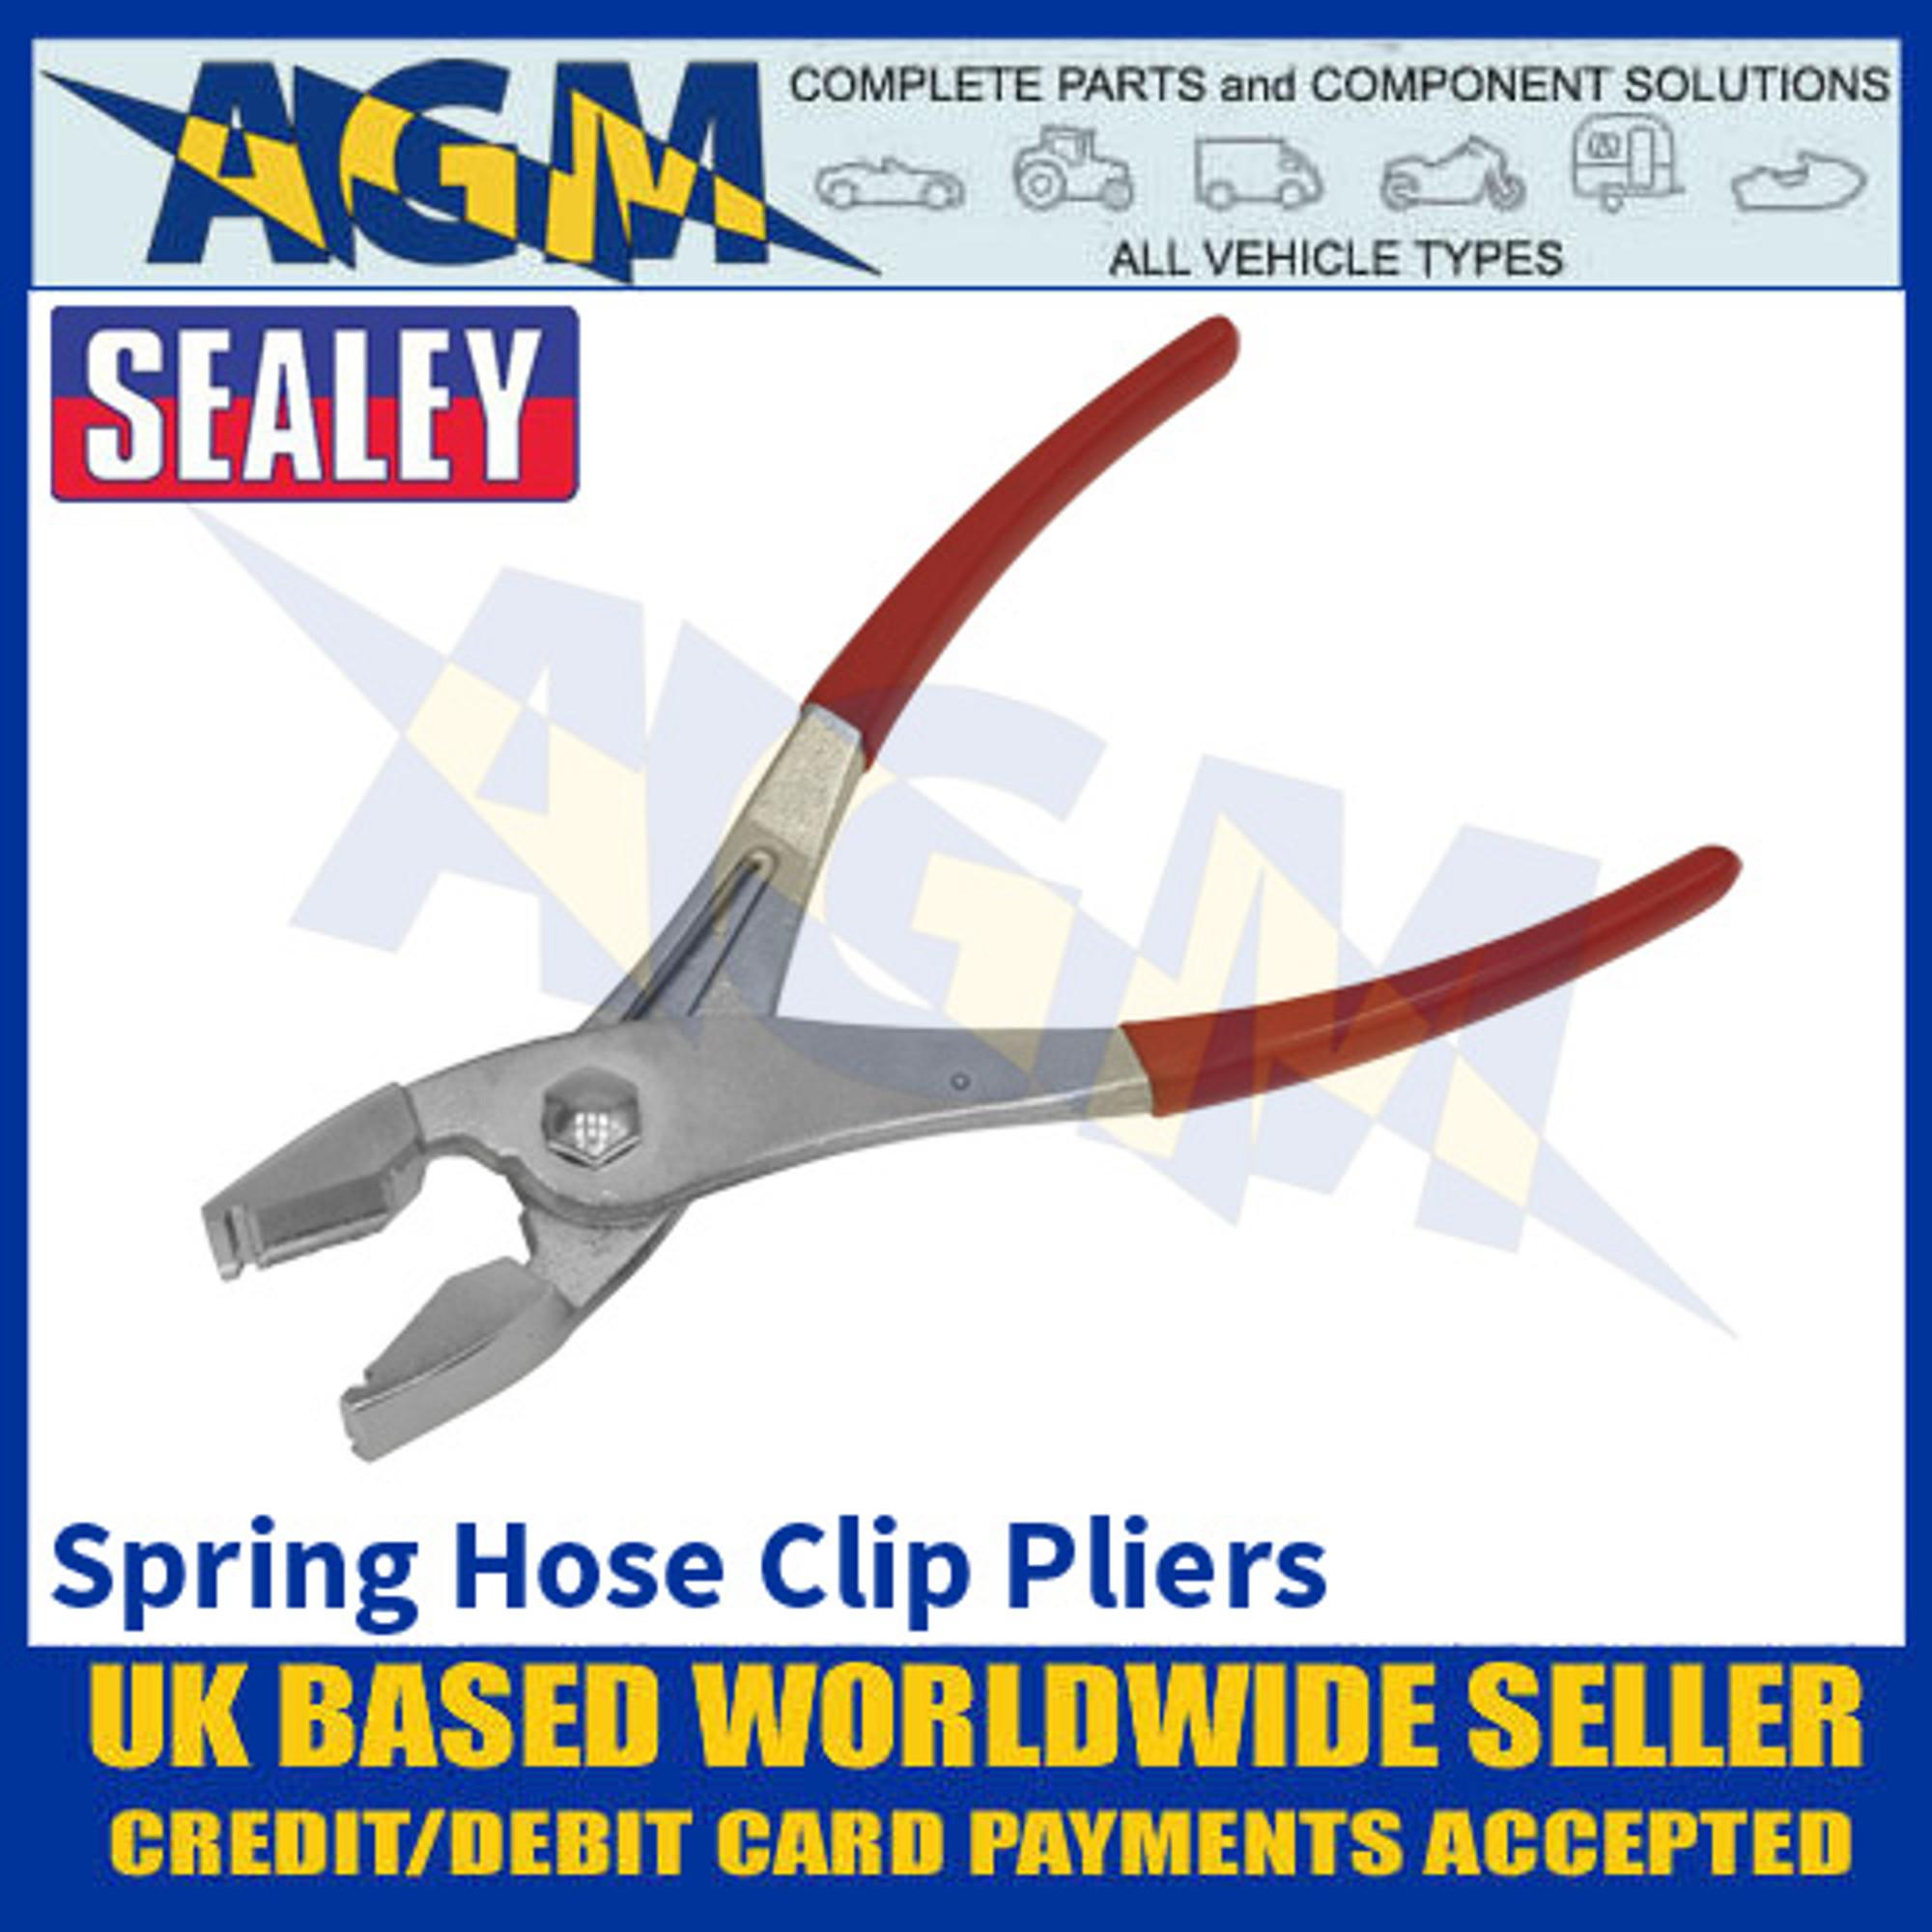 Sealey VS1674 Spring Hose Clip Pliers - Pliers for Spring Hose Clips